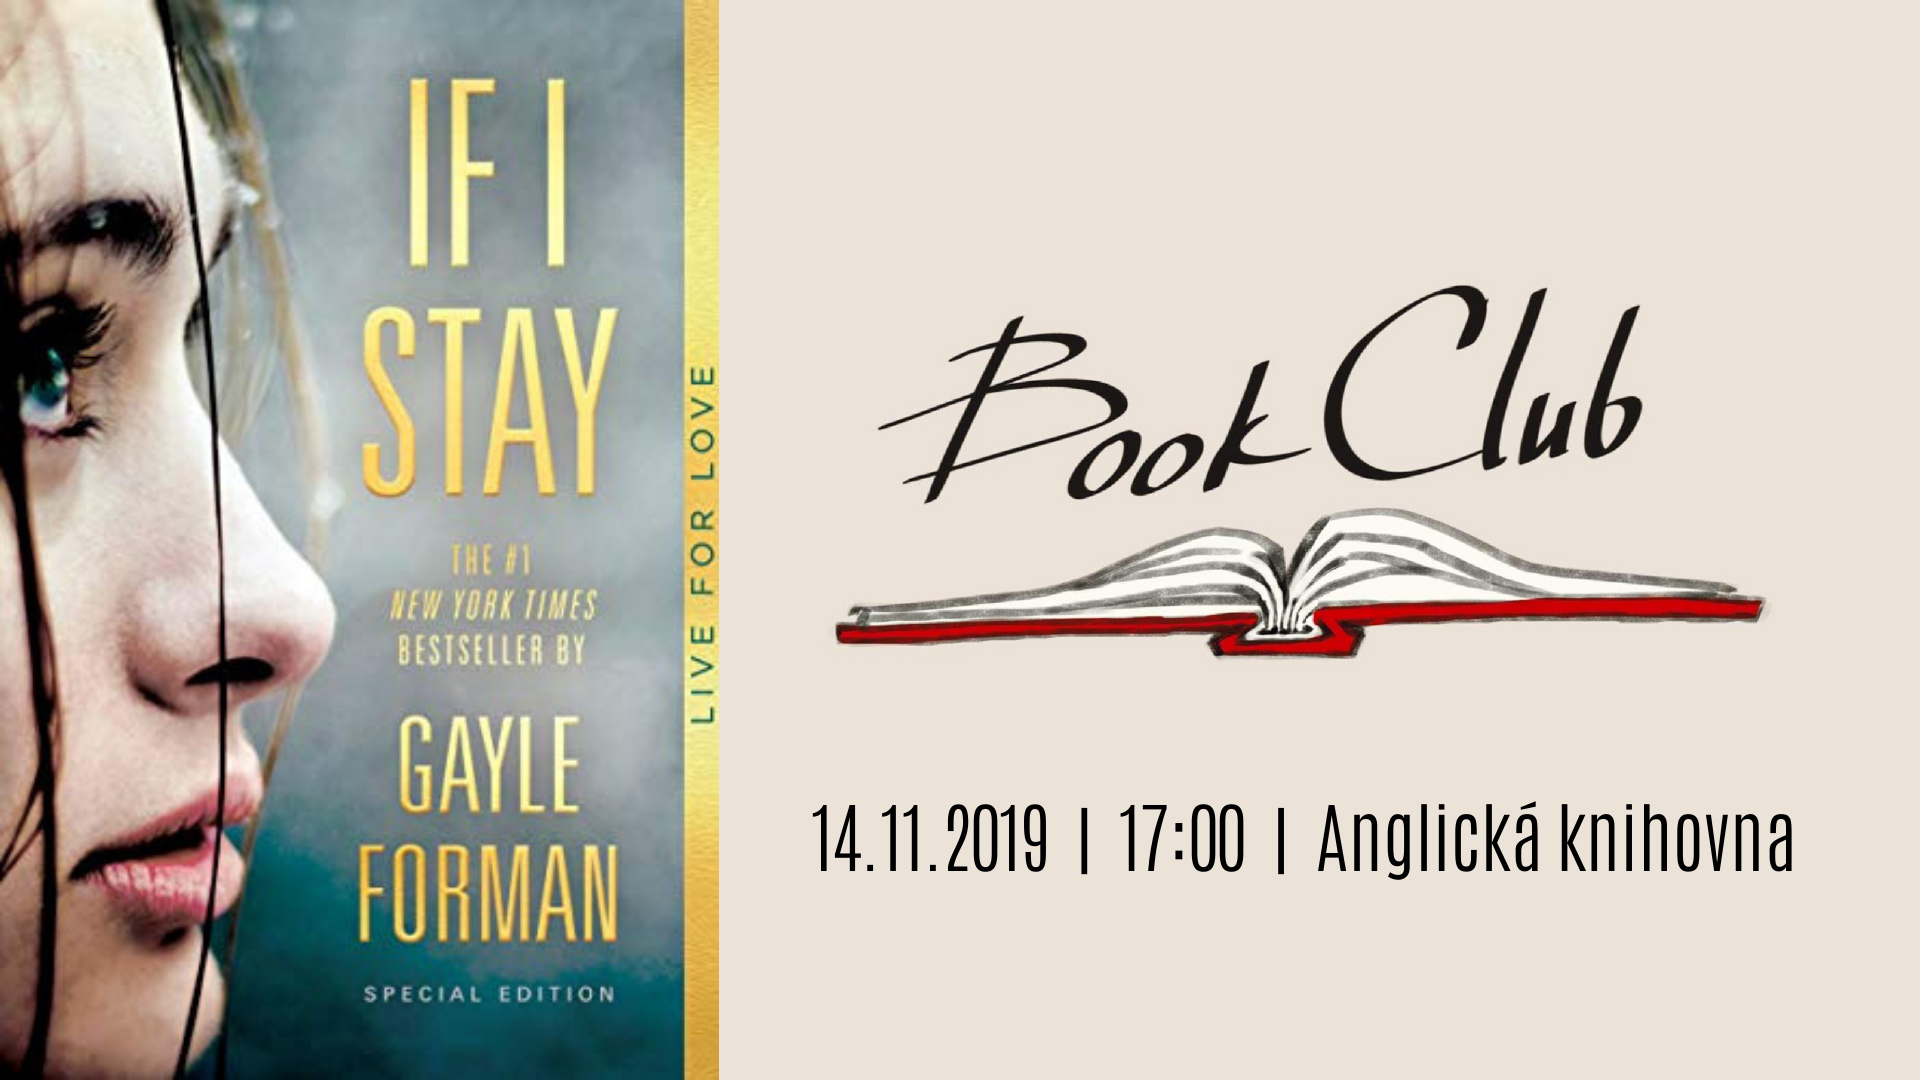 Book Club - If I Stay